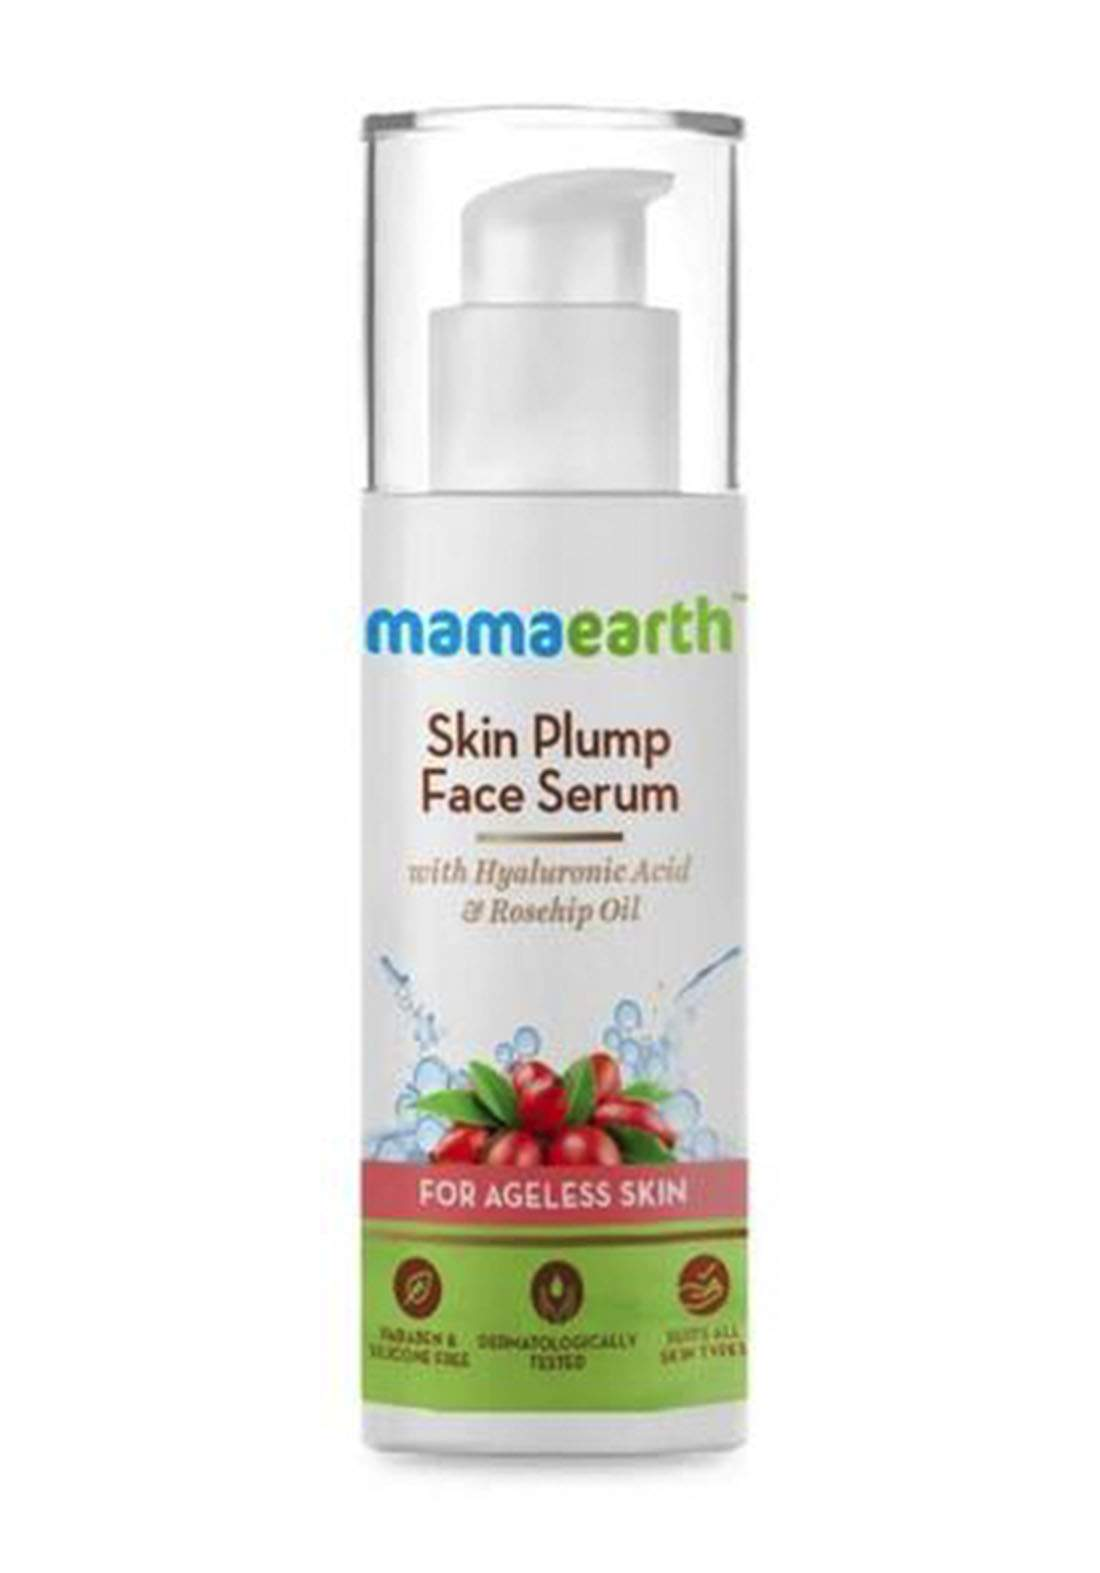 Mamaearth Skin Plump Face Serum 30ml سيروم للبشرة